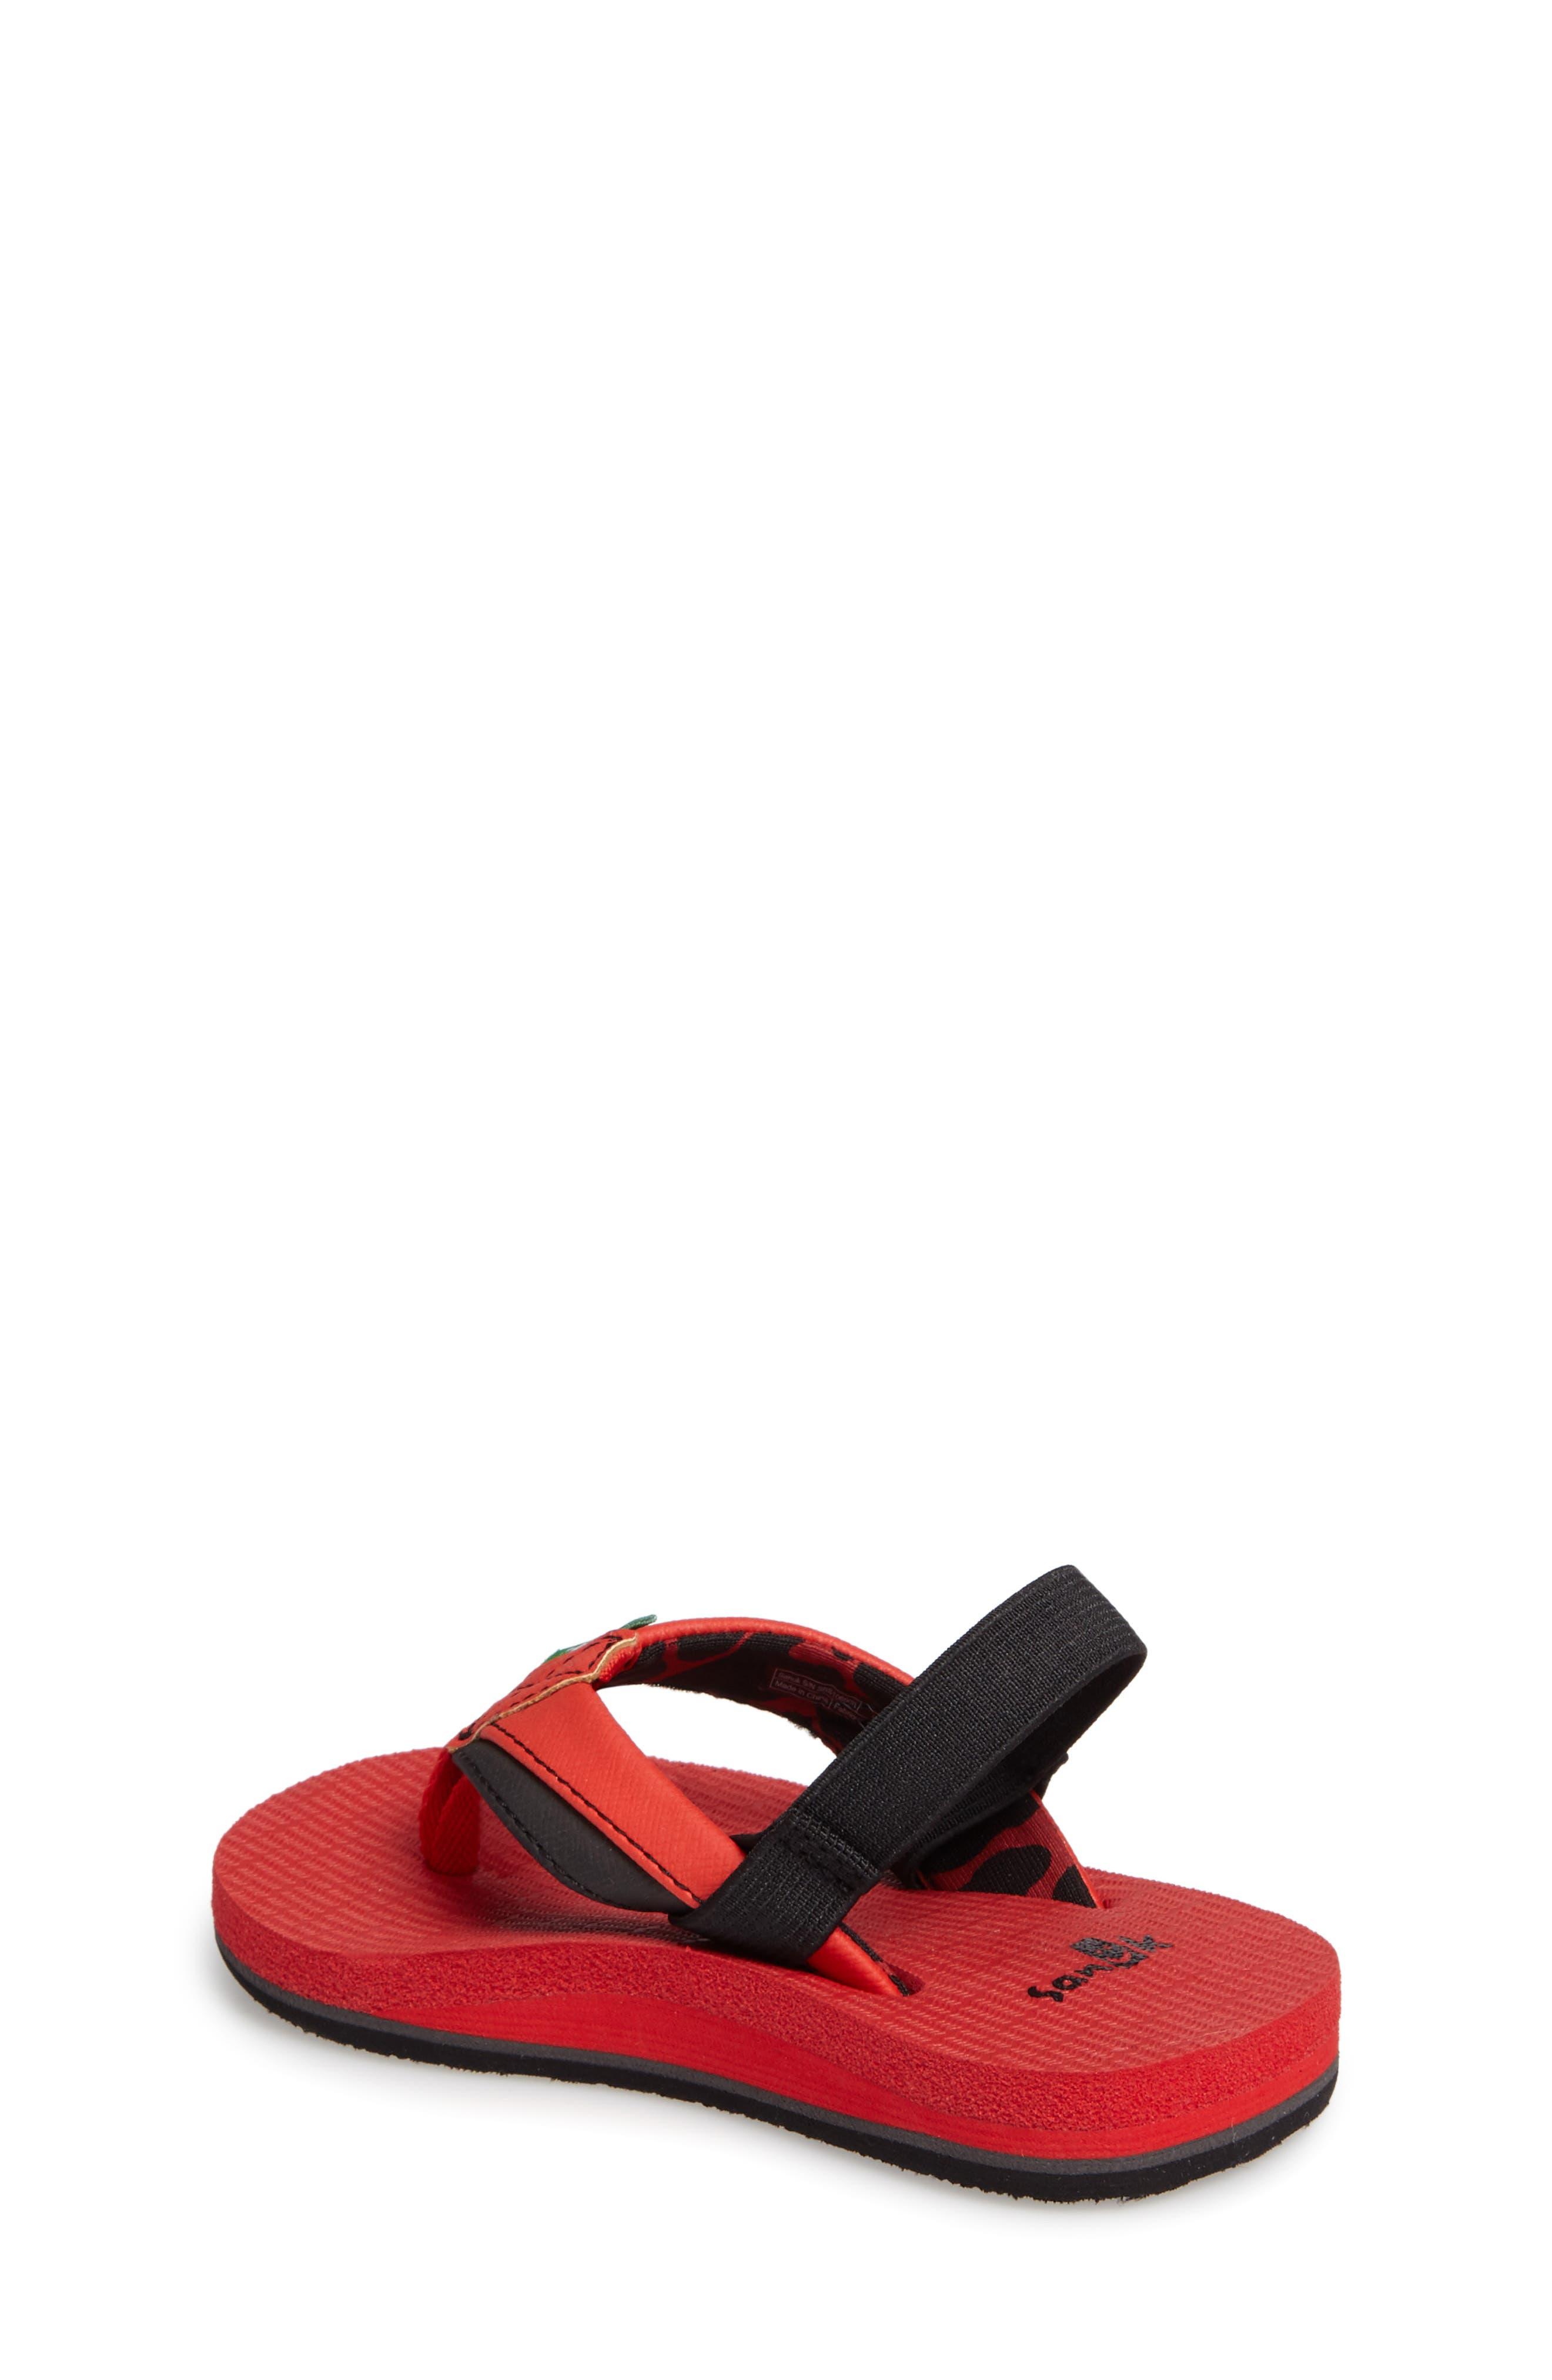 'Rootbeer Cozy' Lightweight Flip Flop Sandal,                             Alternate thumbnail 11, color,